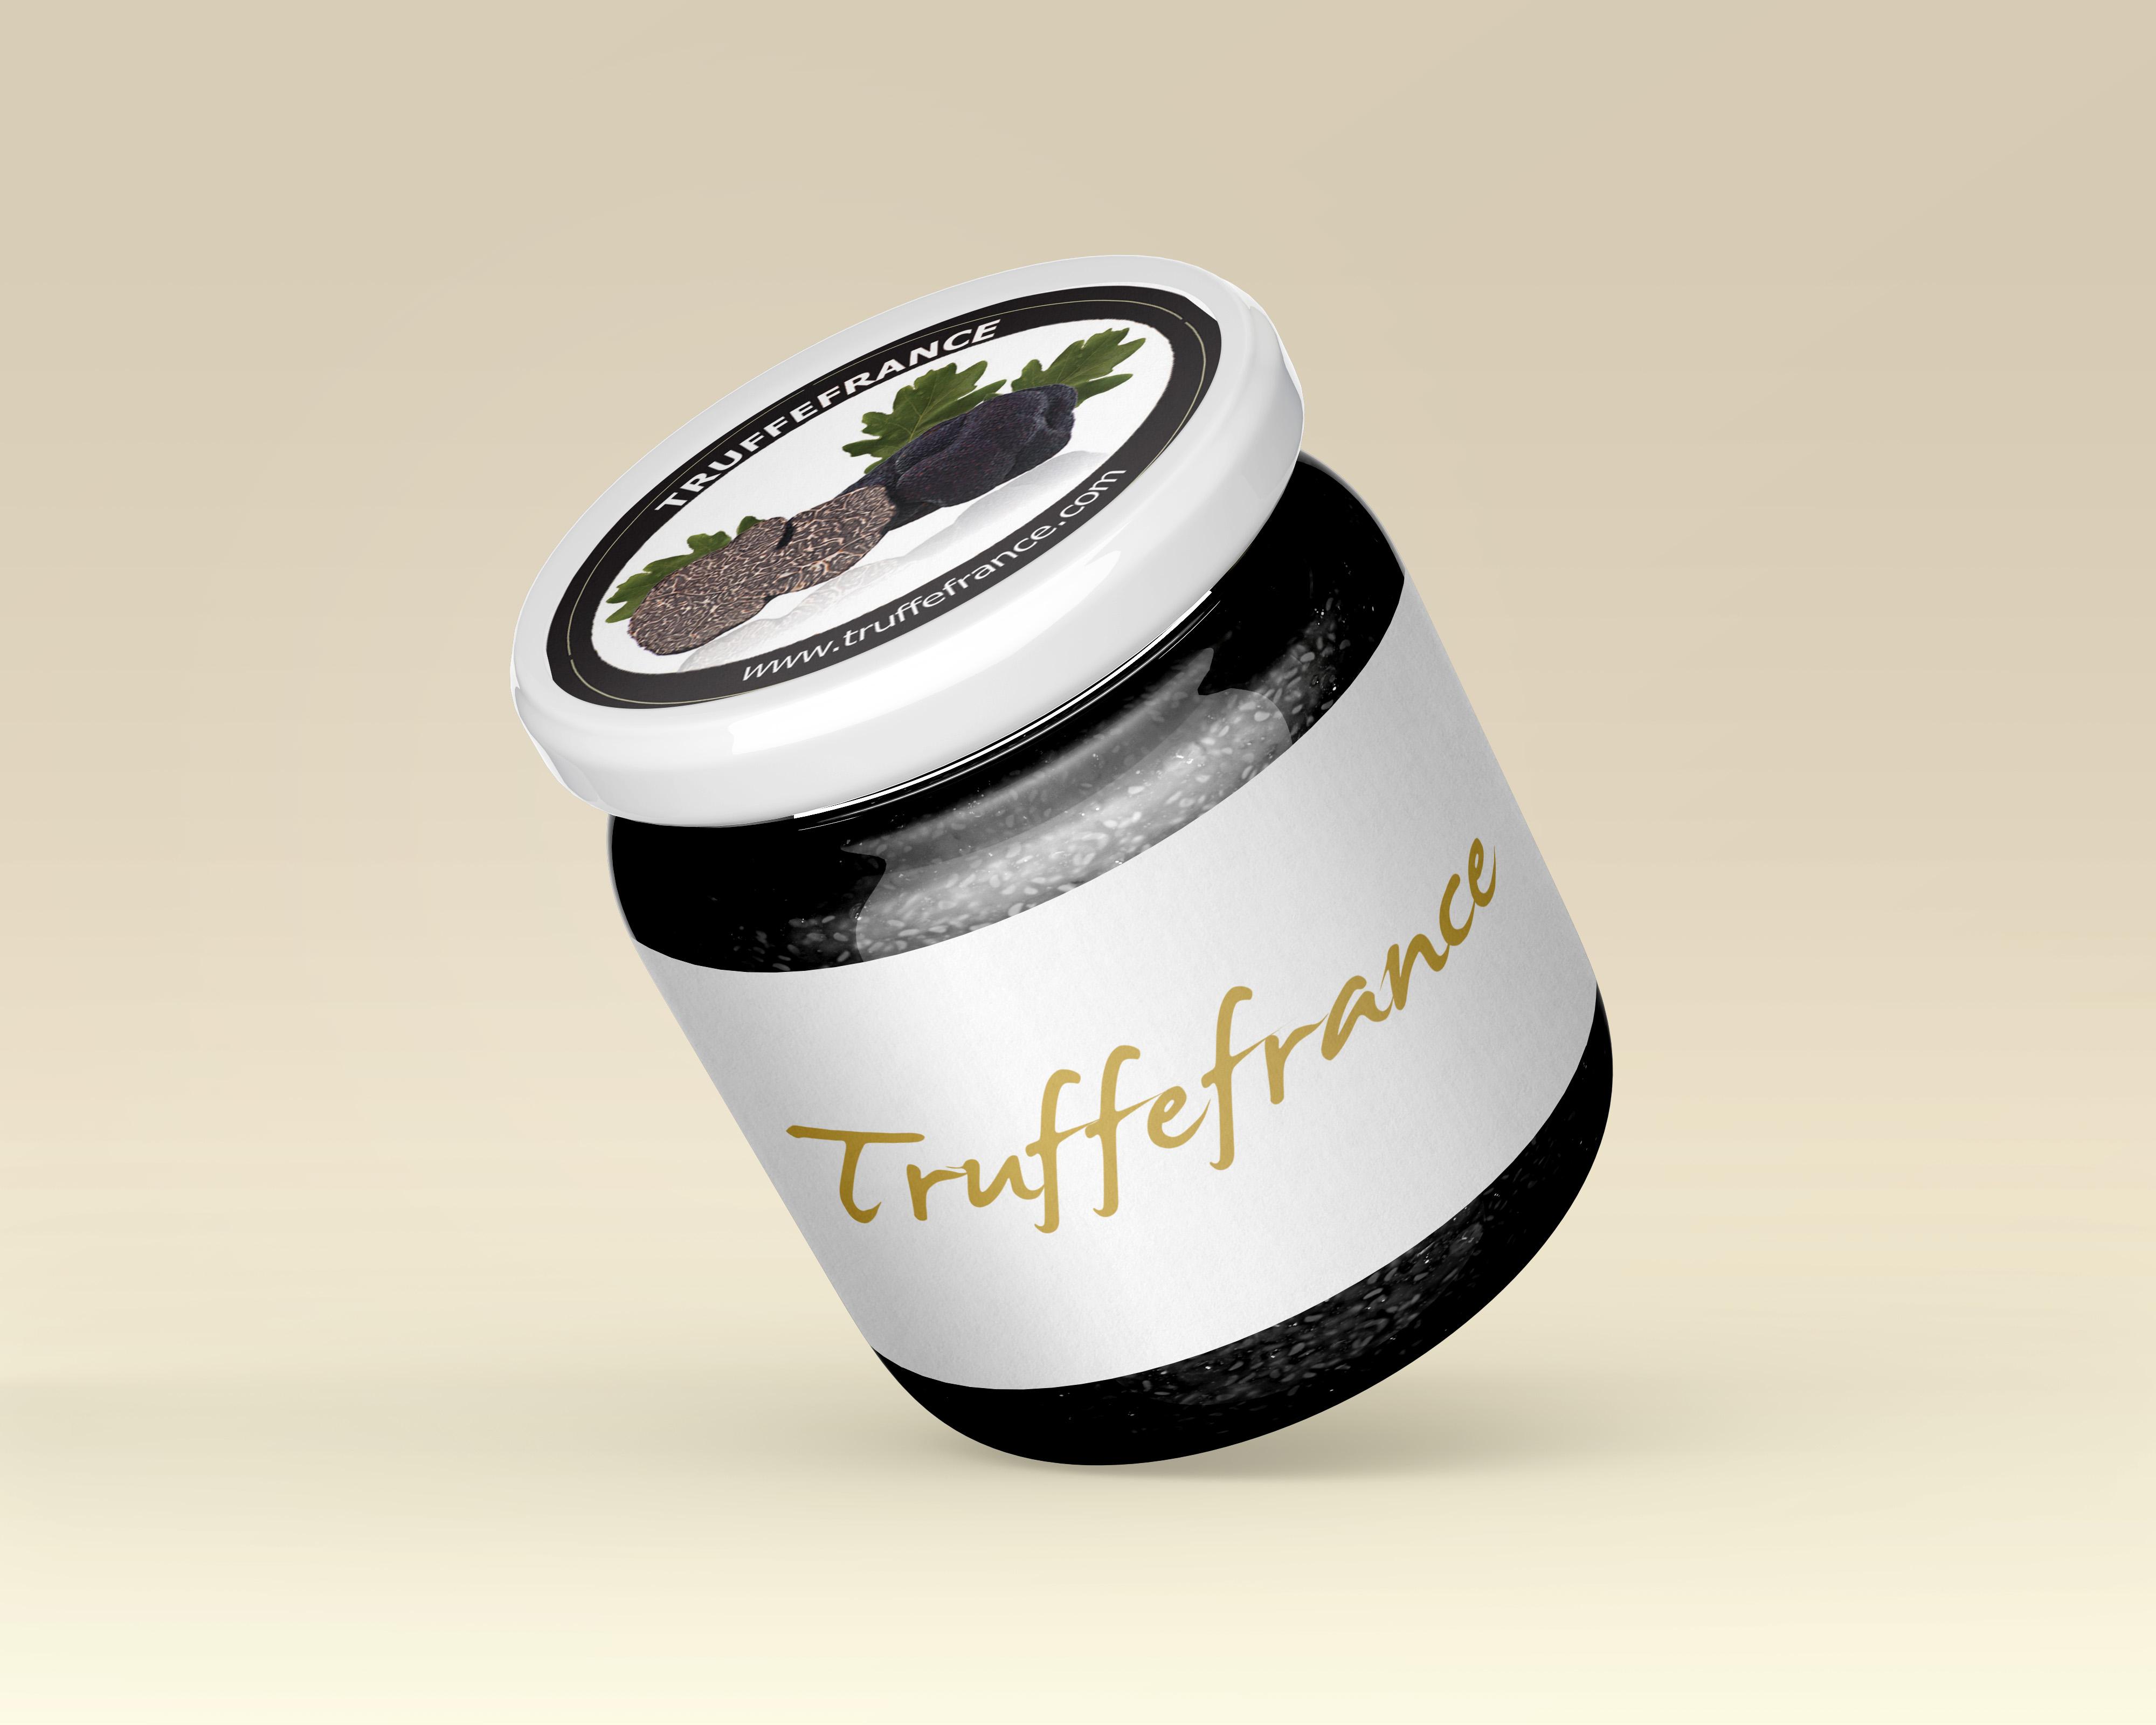 mockup CorazyOwl pot de truffe noire